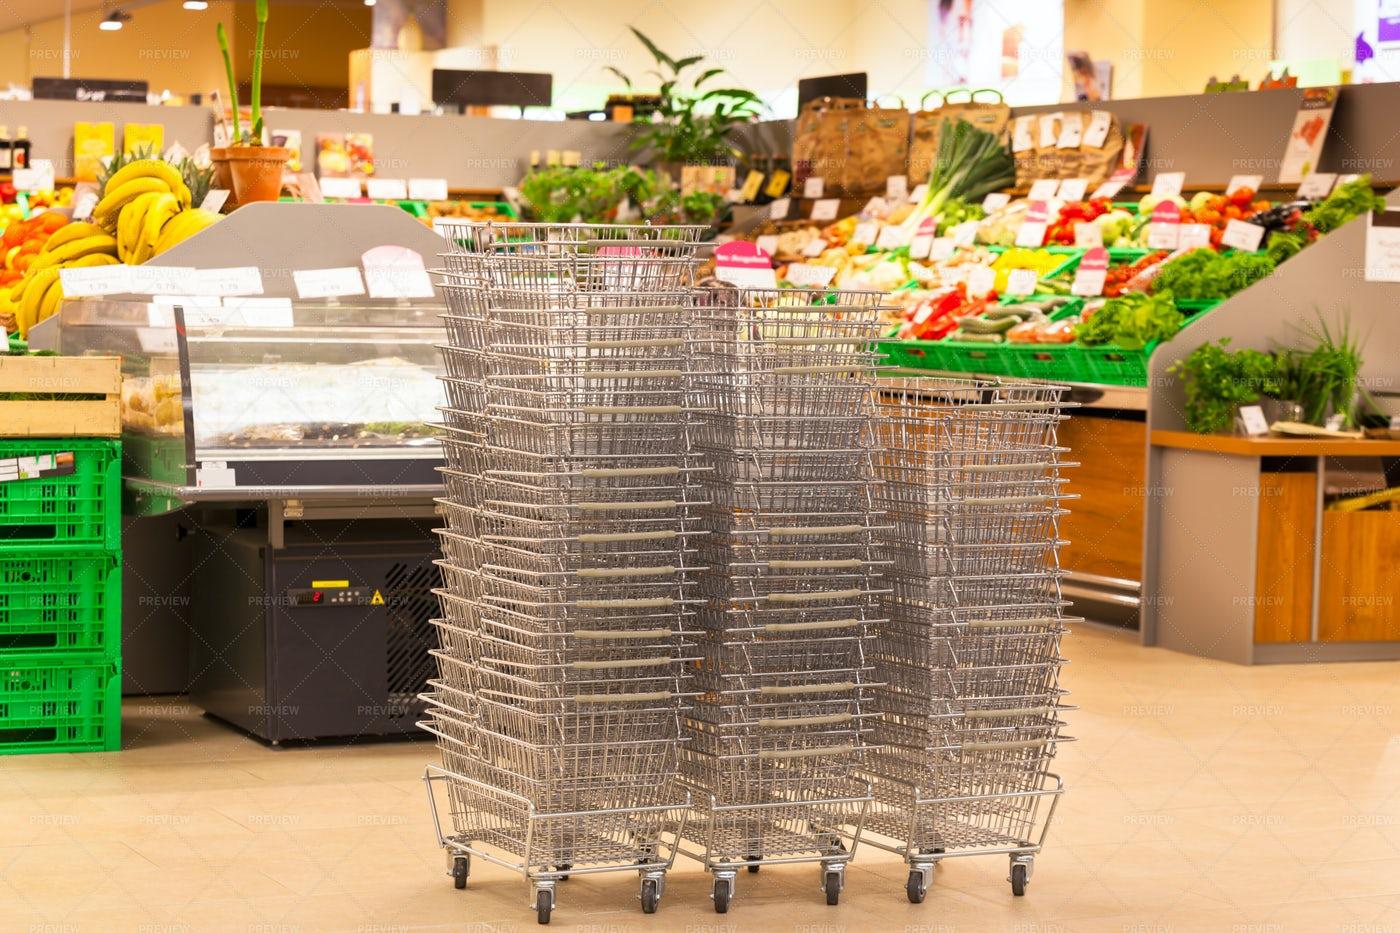 Shopping Basket Stacks: Stock Photos